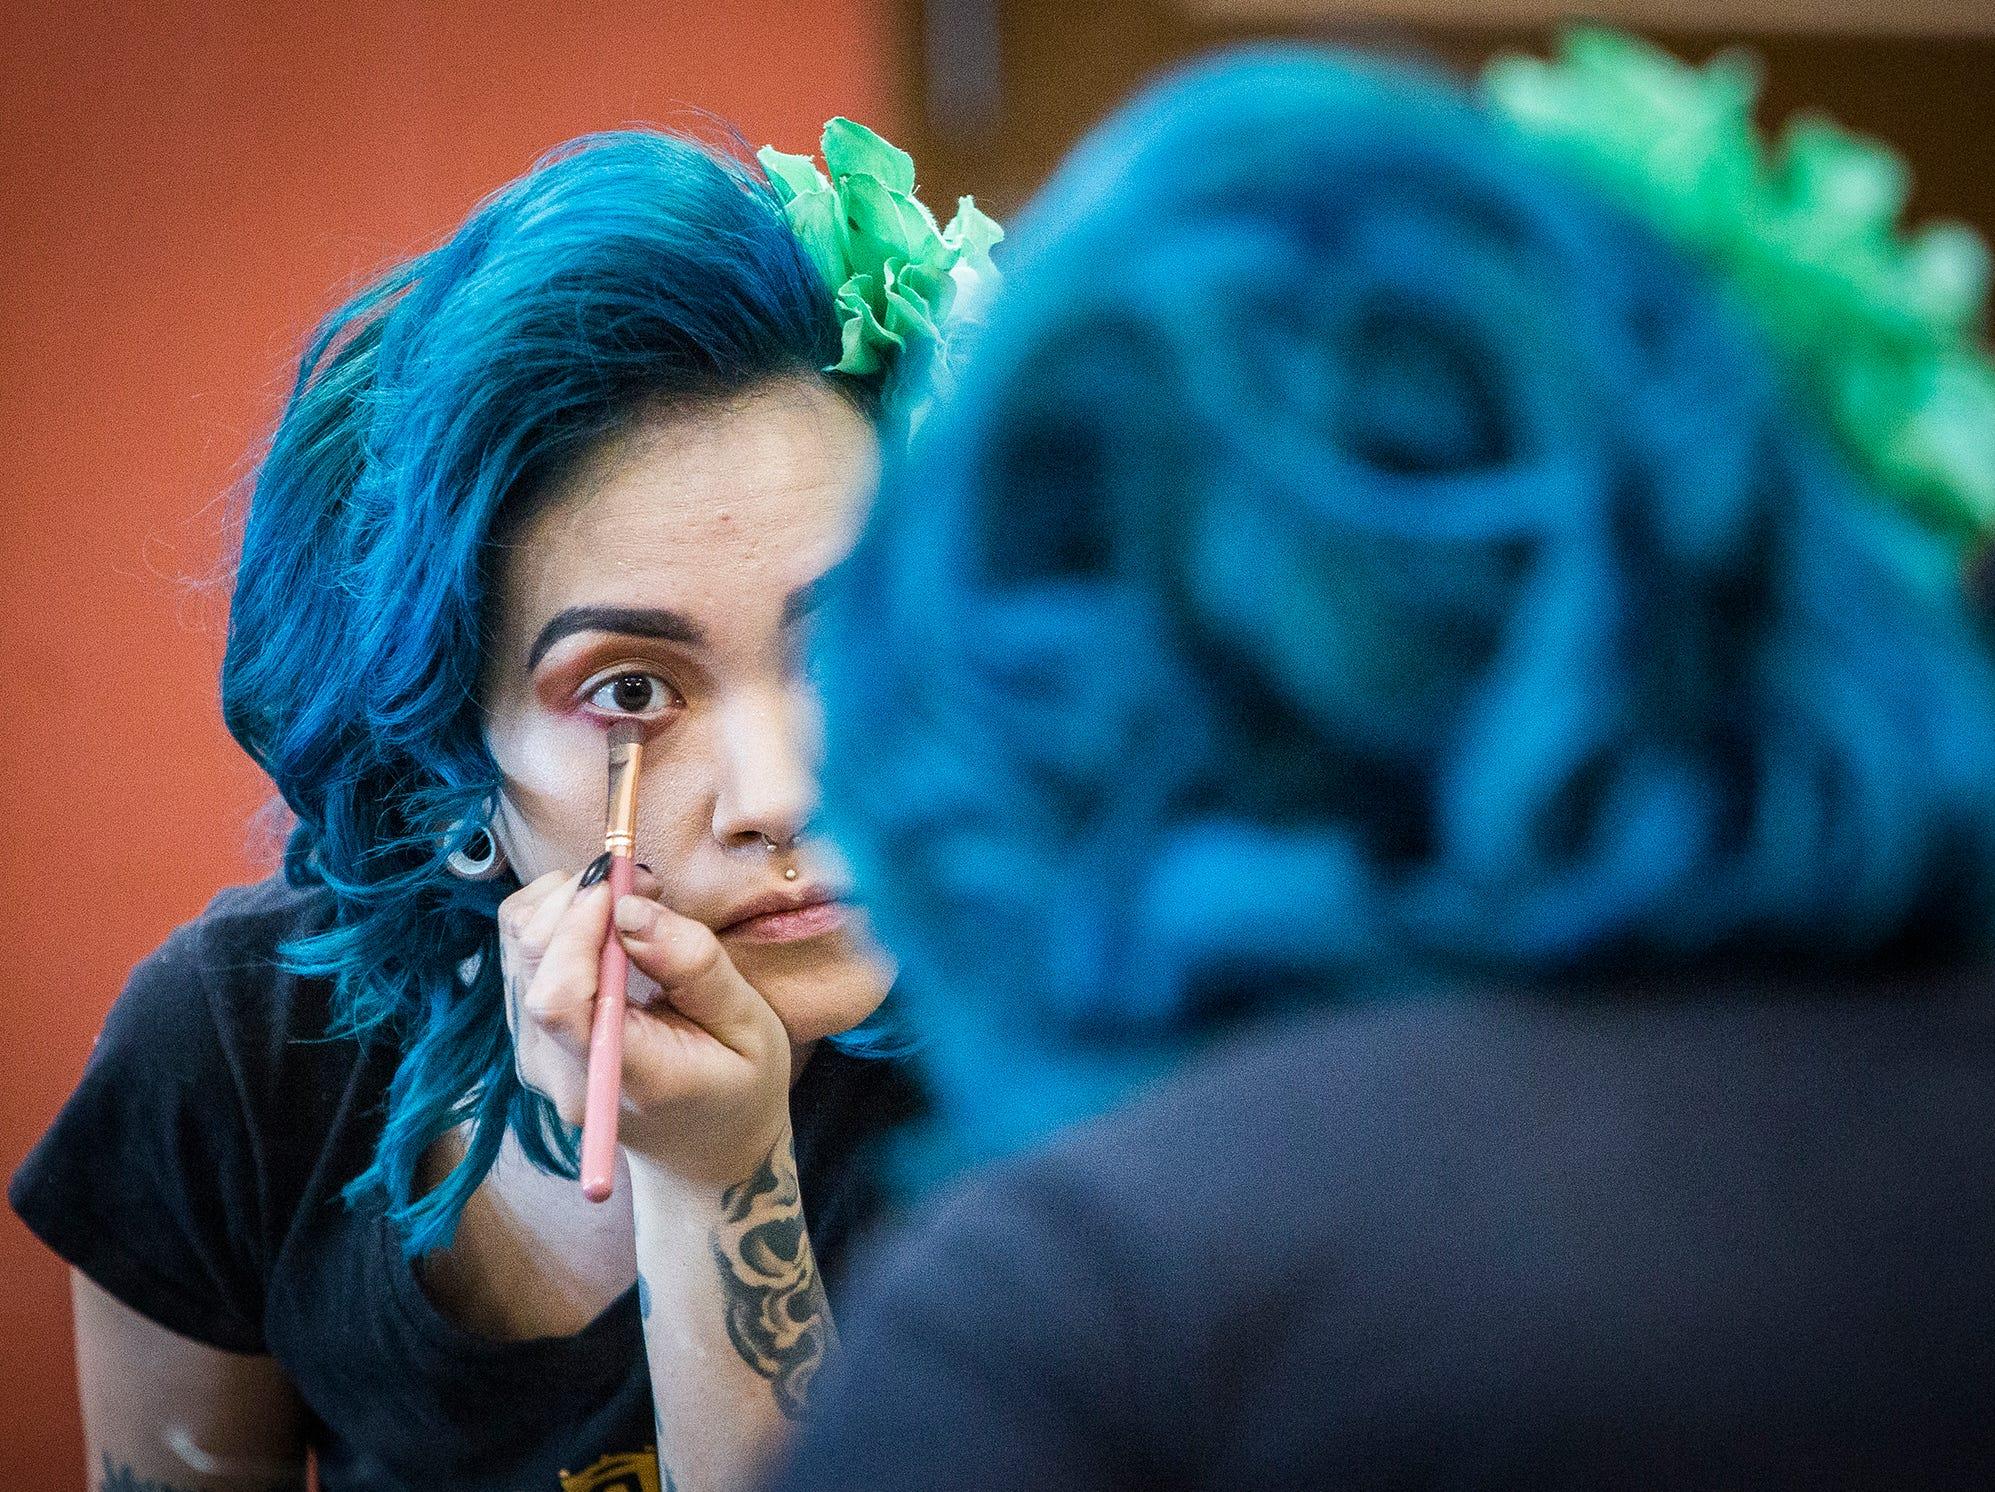 Greta Glee applies makeup at the Muncie Civic Theatre.